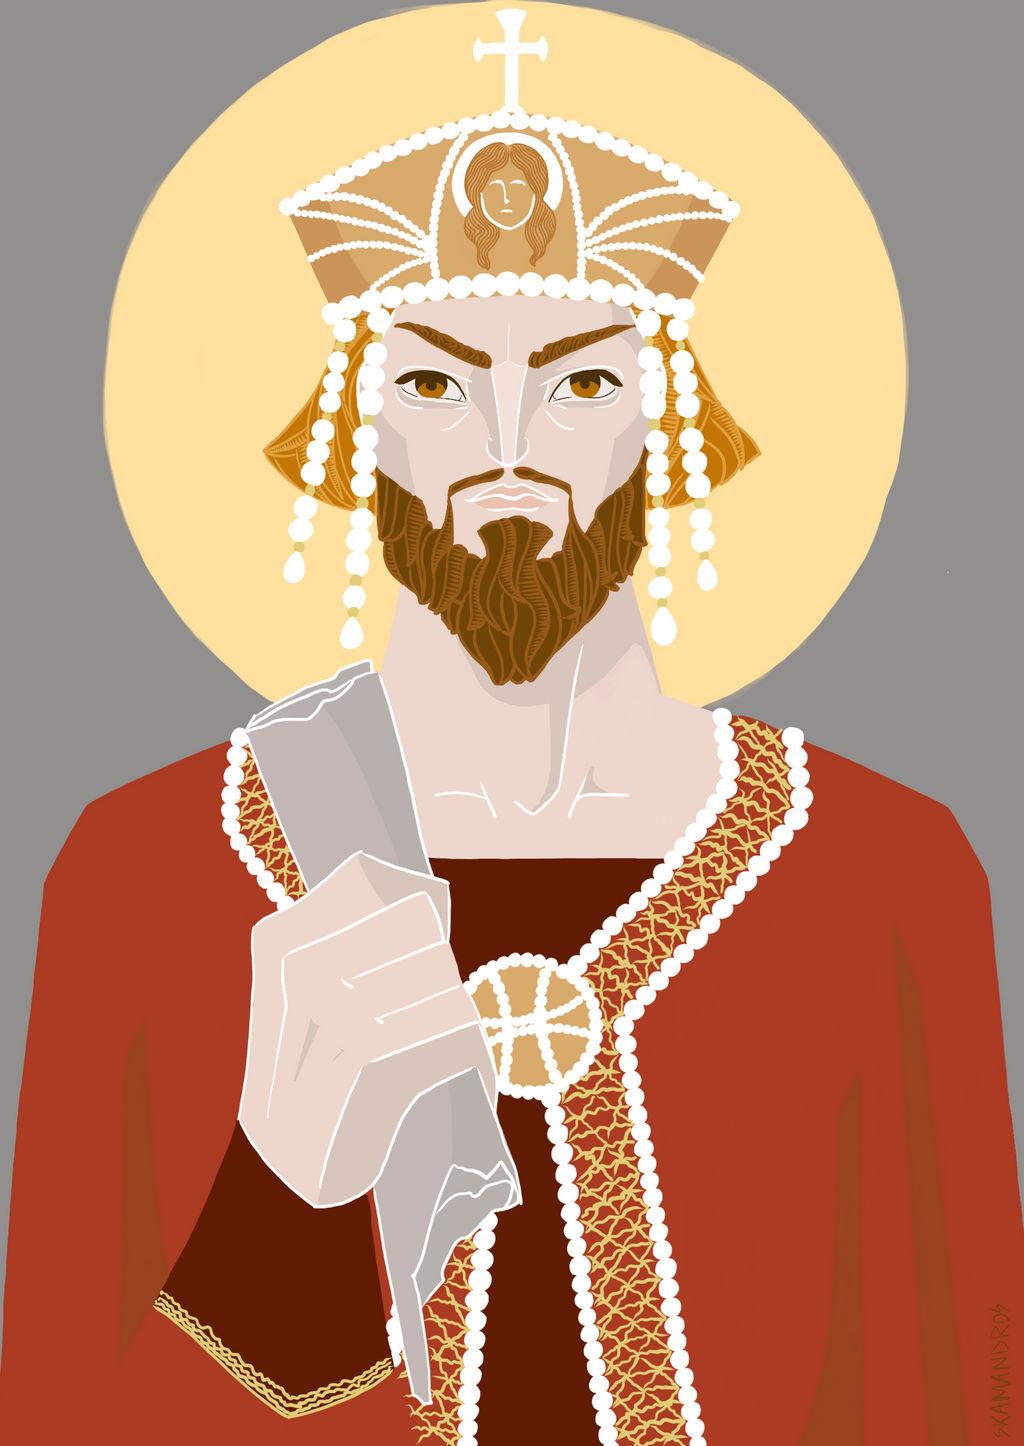 emperor_heraclius_by_skamandros_dc31yj5-fullview